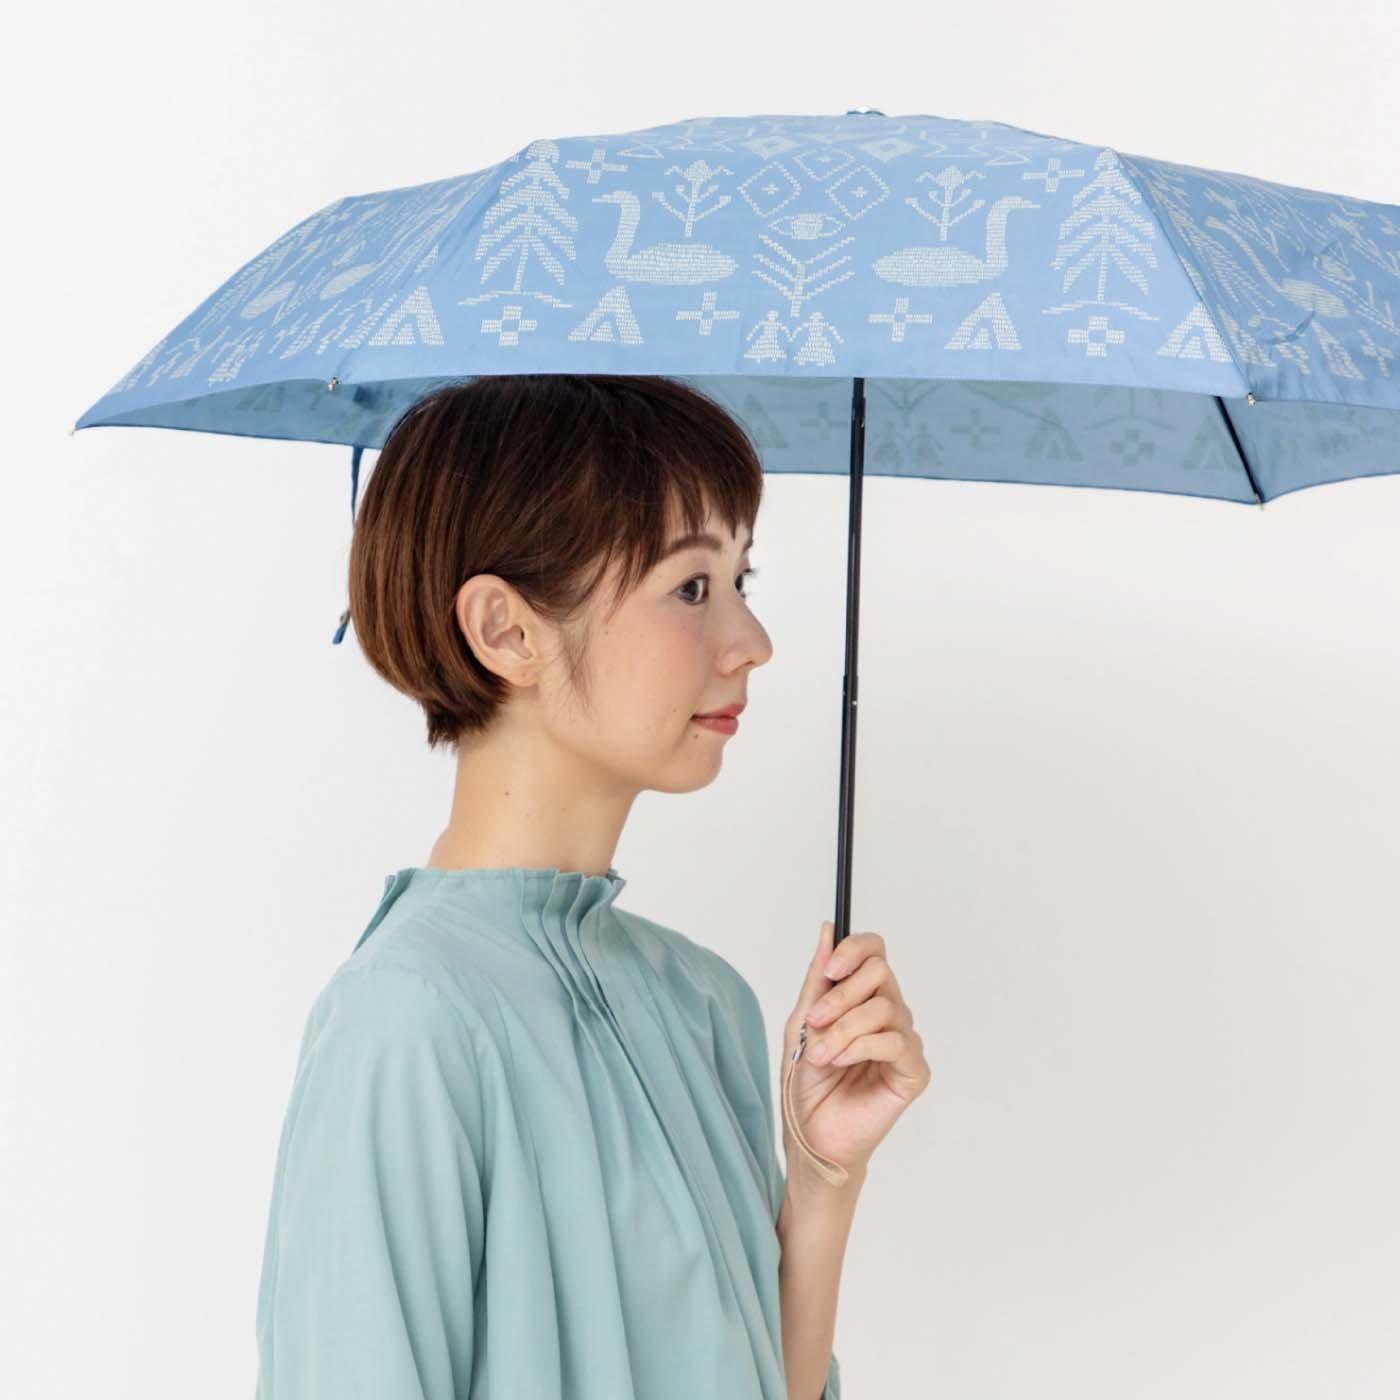 SAANA JA OLLI サーナ ヤ オッリ トートバッグ付き折りたたみ傘の会